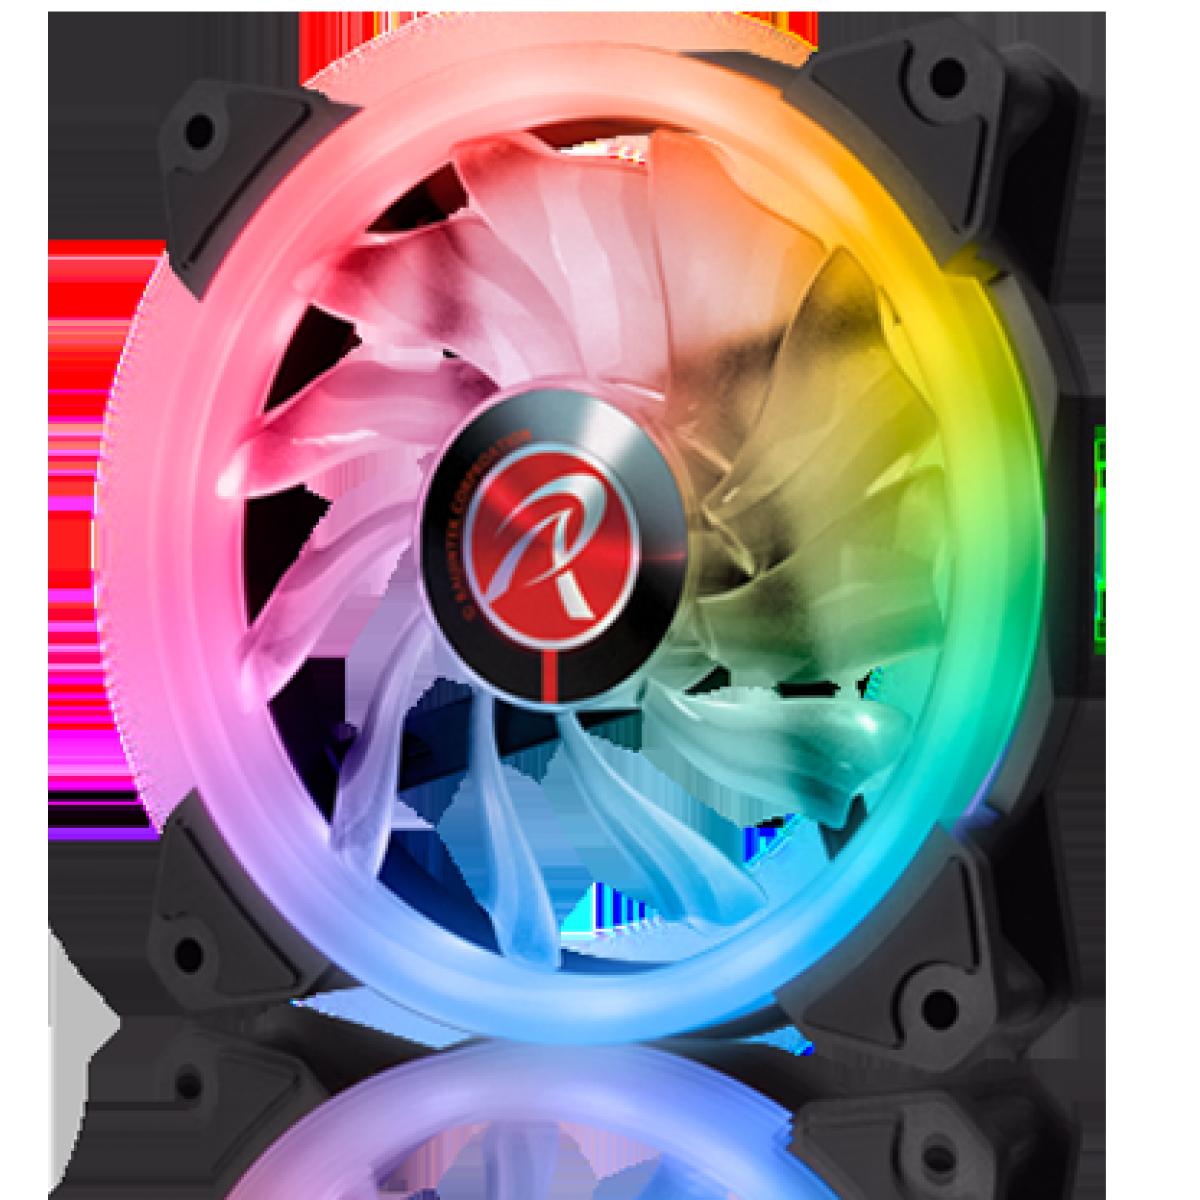 Kit Fan com 3 Unidades Raijintek Iris 12 RBW ADD-3, ARGB, 120mm, 0R40B00112